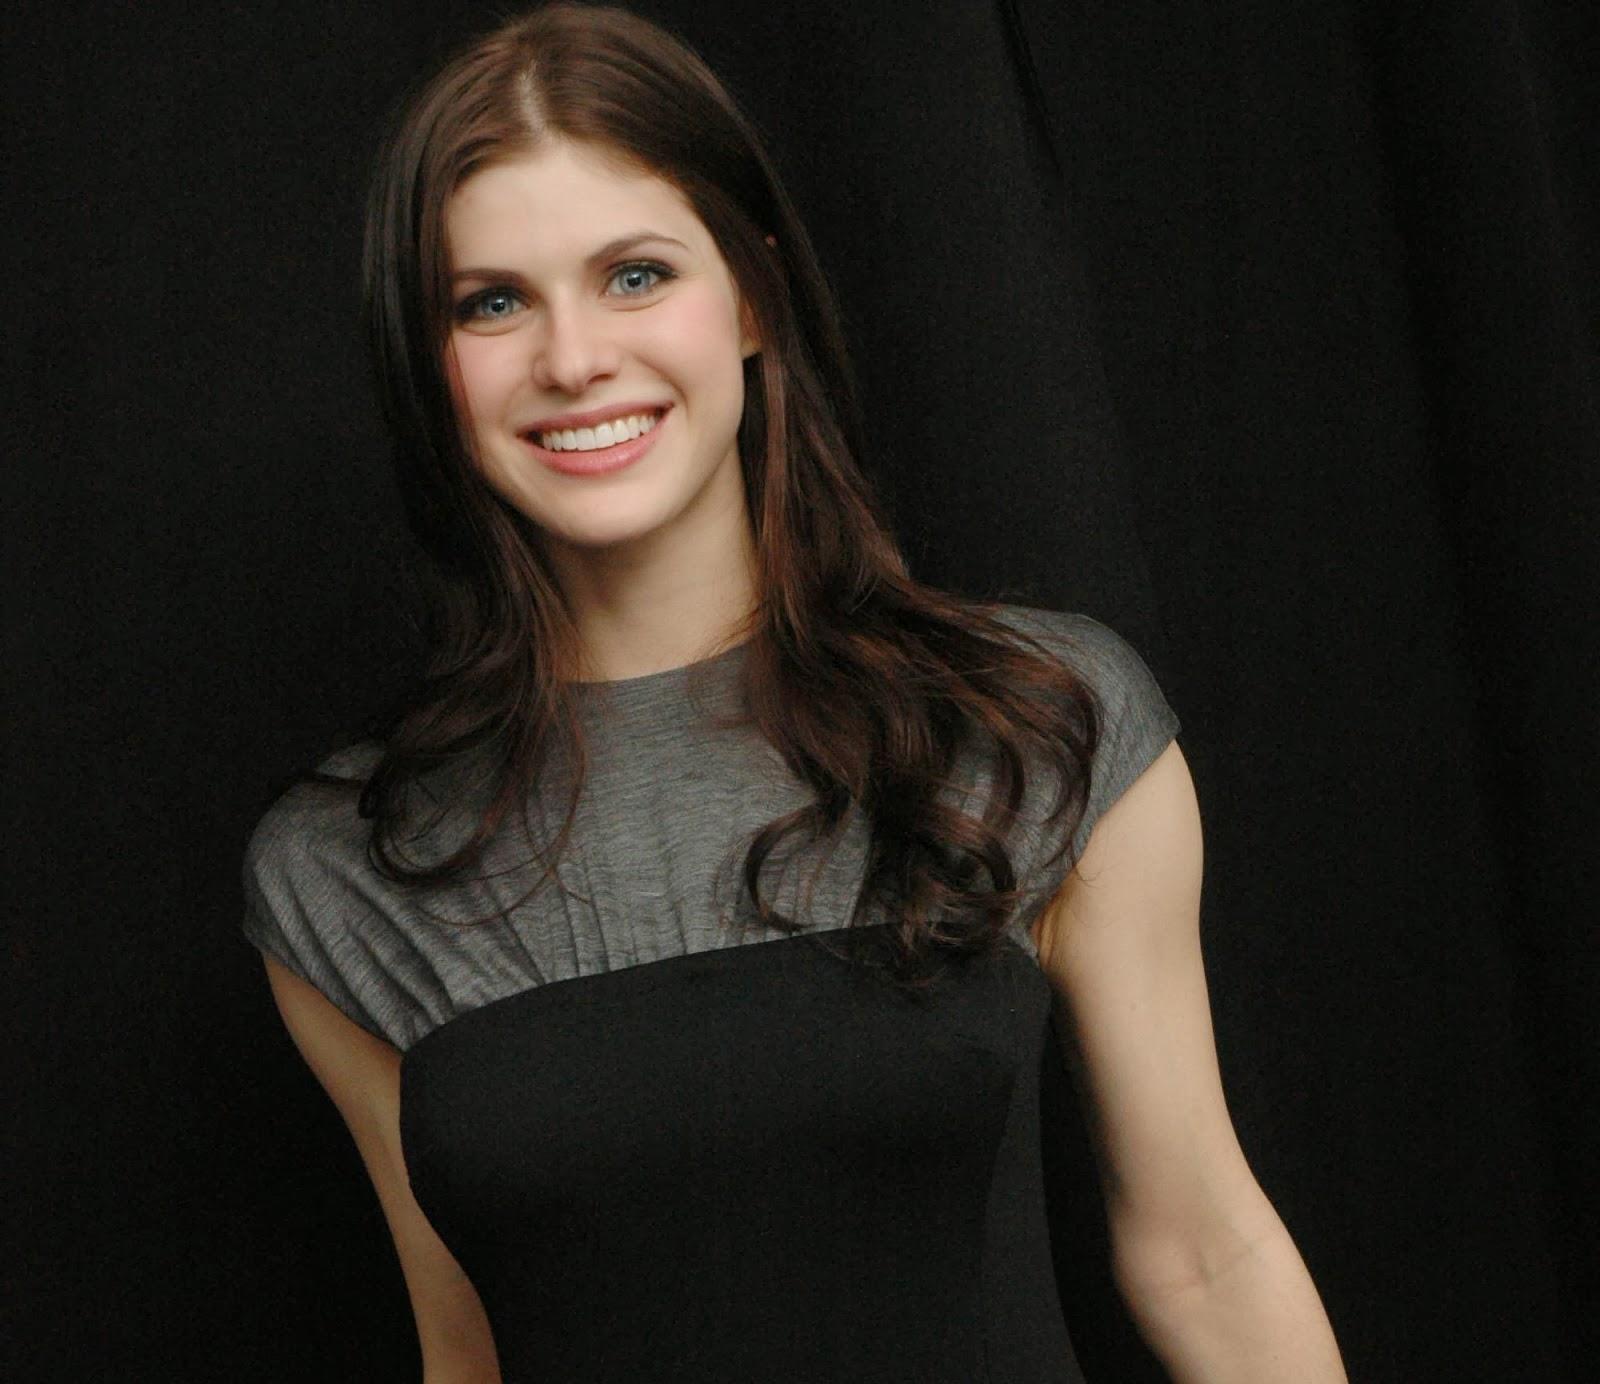 hollywood actress wallpaper: alexandra daddario hd wallpapers